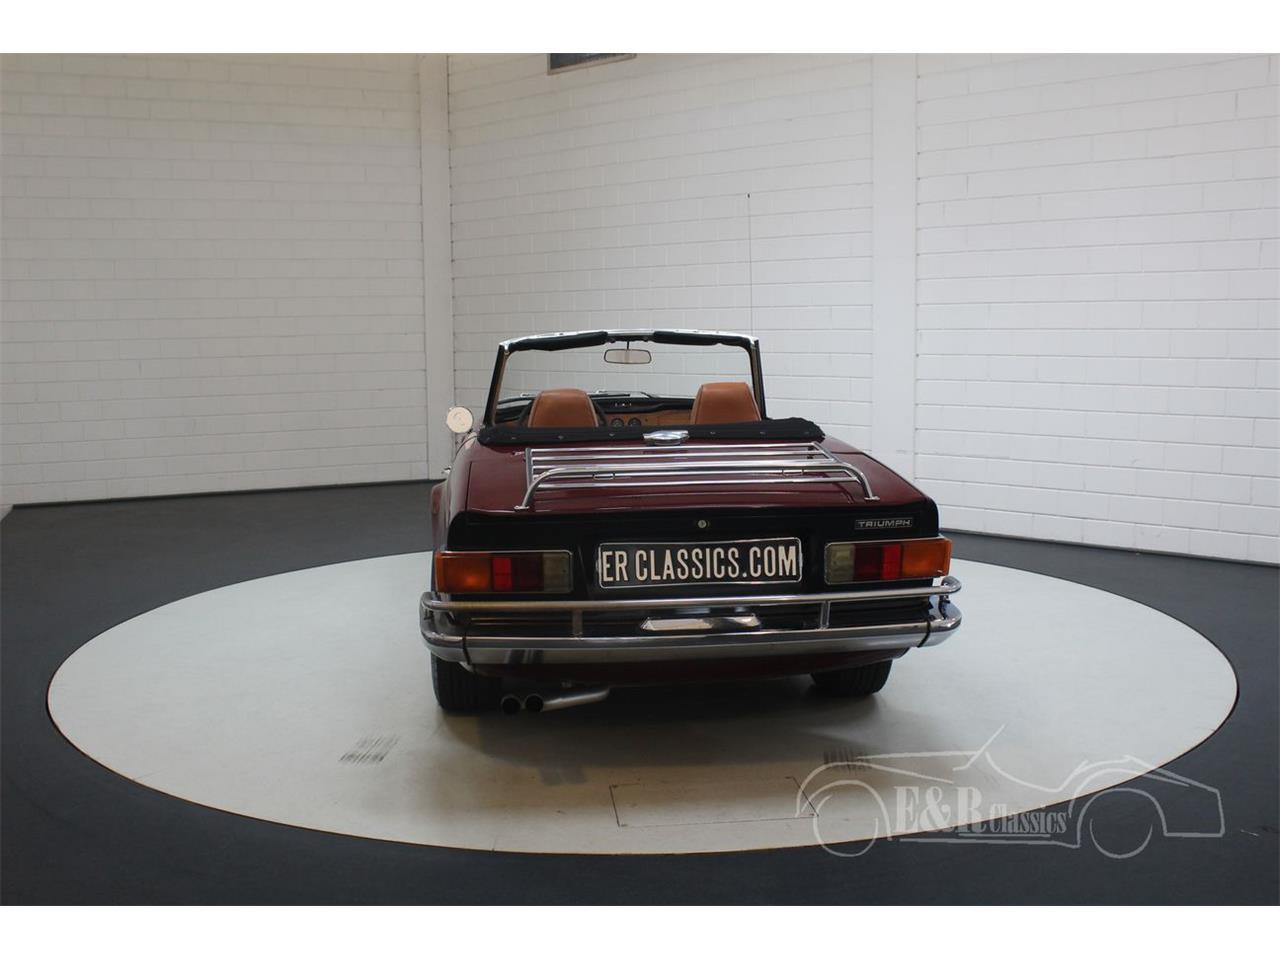 1972 Triumph TR6 (CC-1413211) for sale in Waalwijk, Noord-Brabant